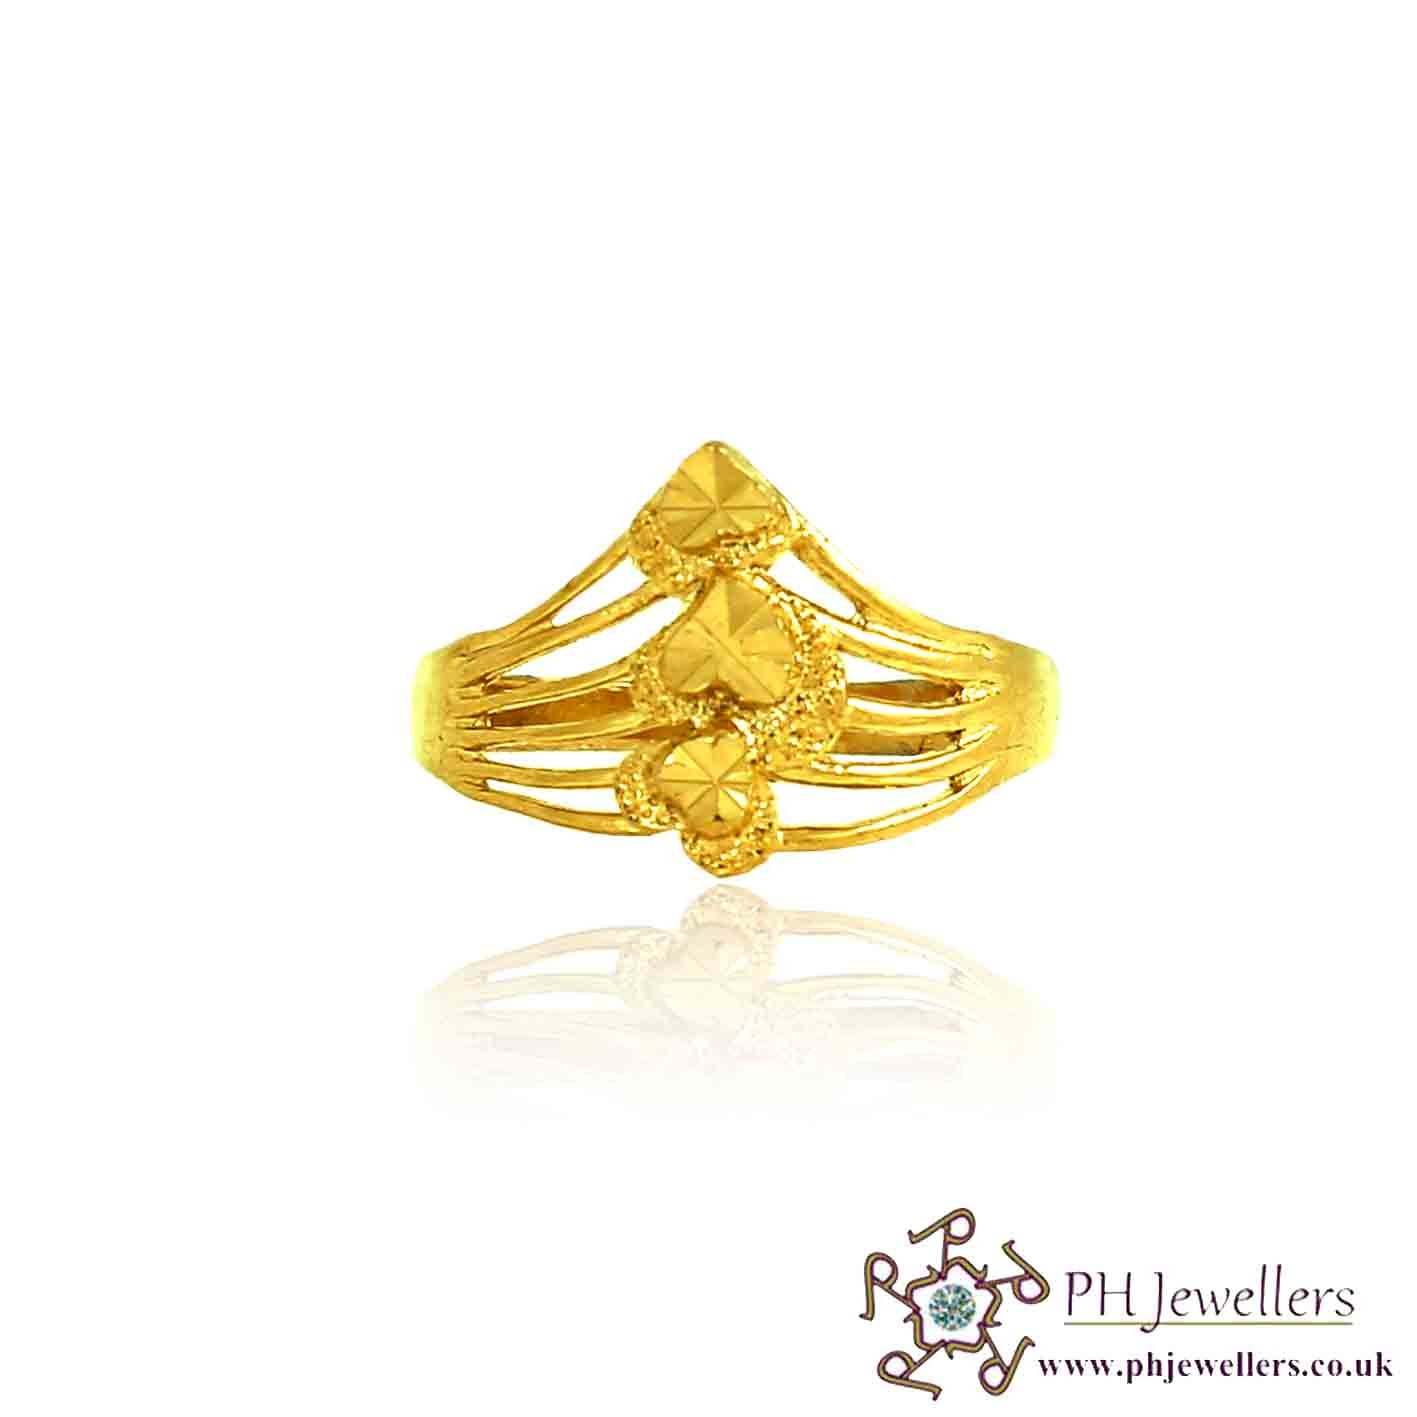 22ct 916 Hallmark Yellow Gold Heart Size O,P Ring PR20 (Ring)